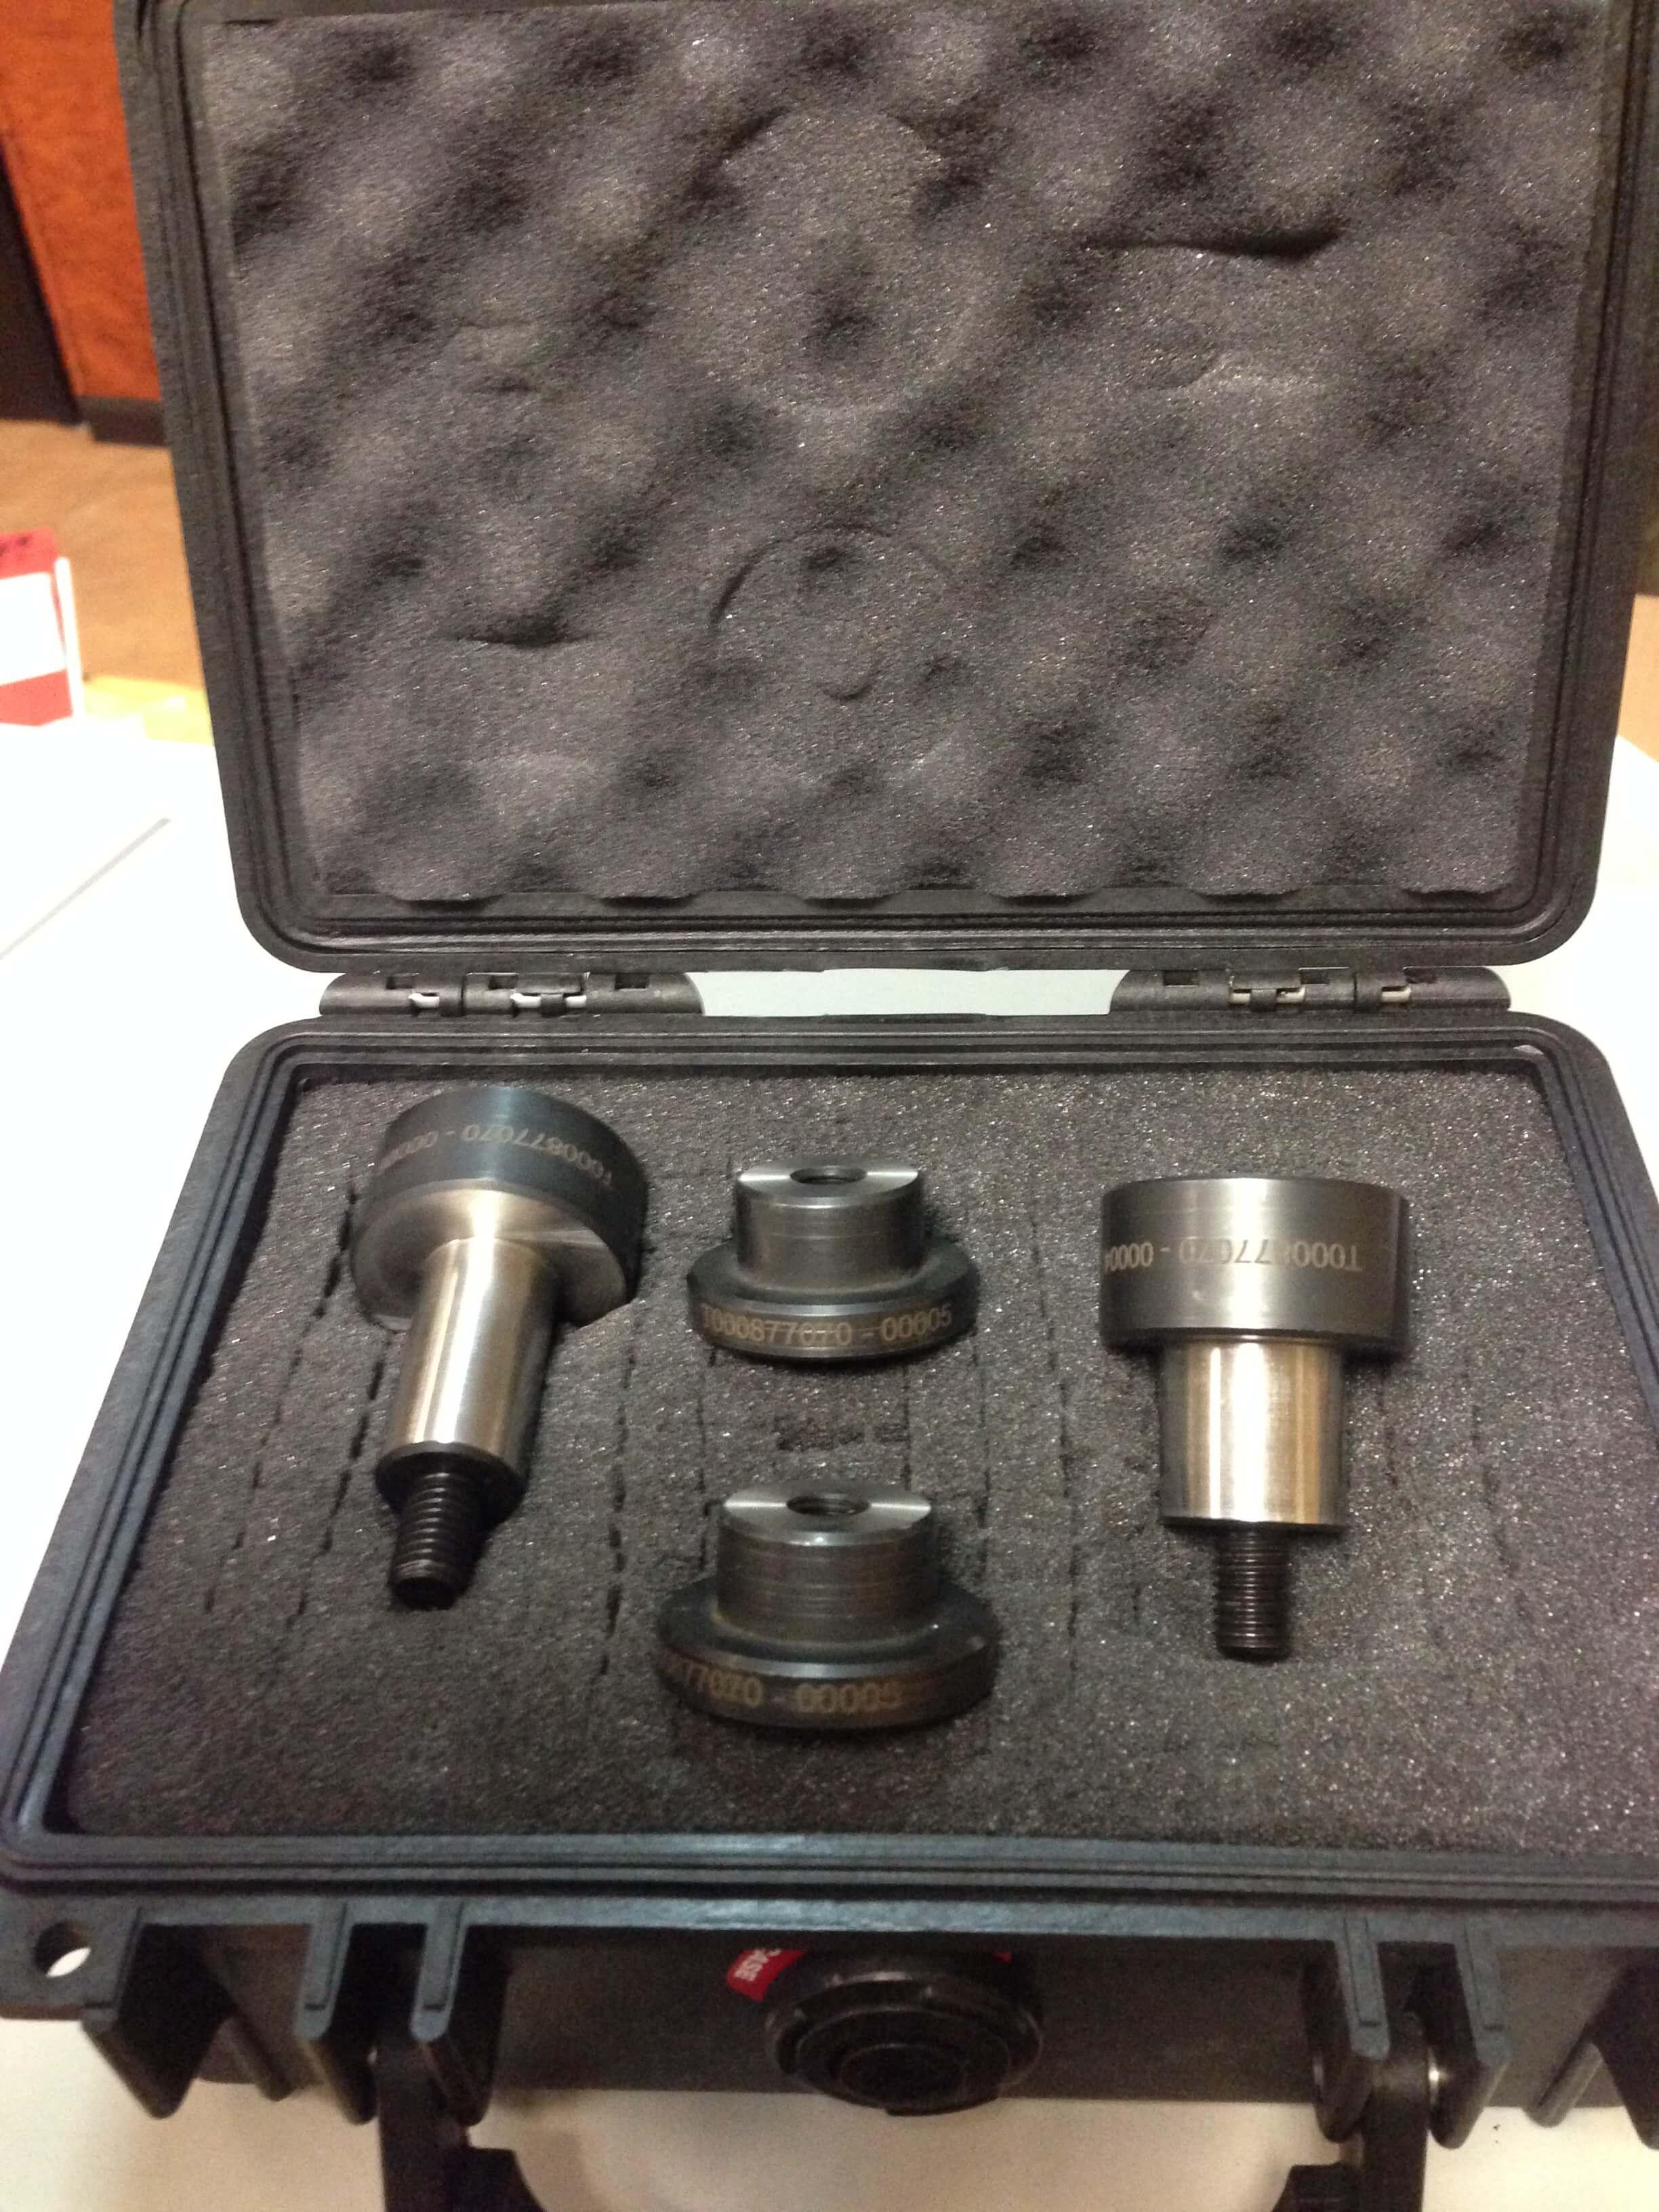 IMG 0723 - General tools